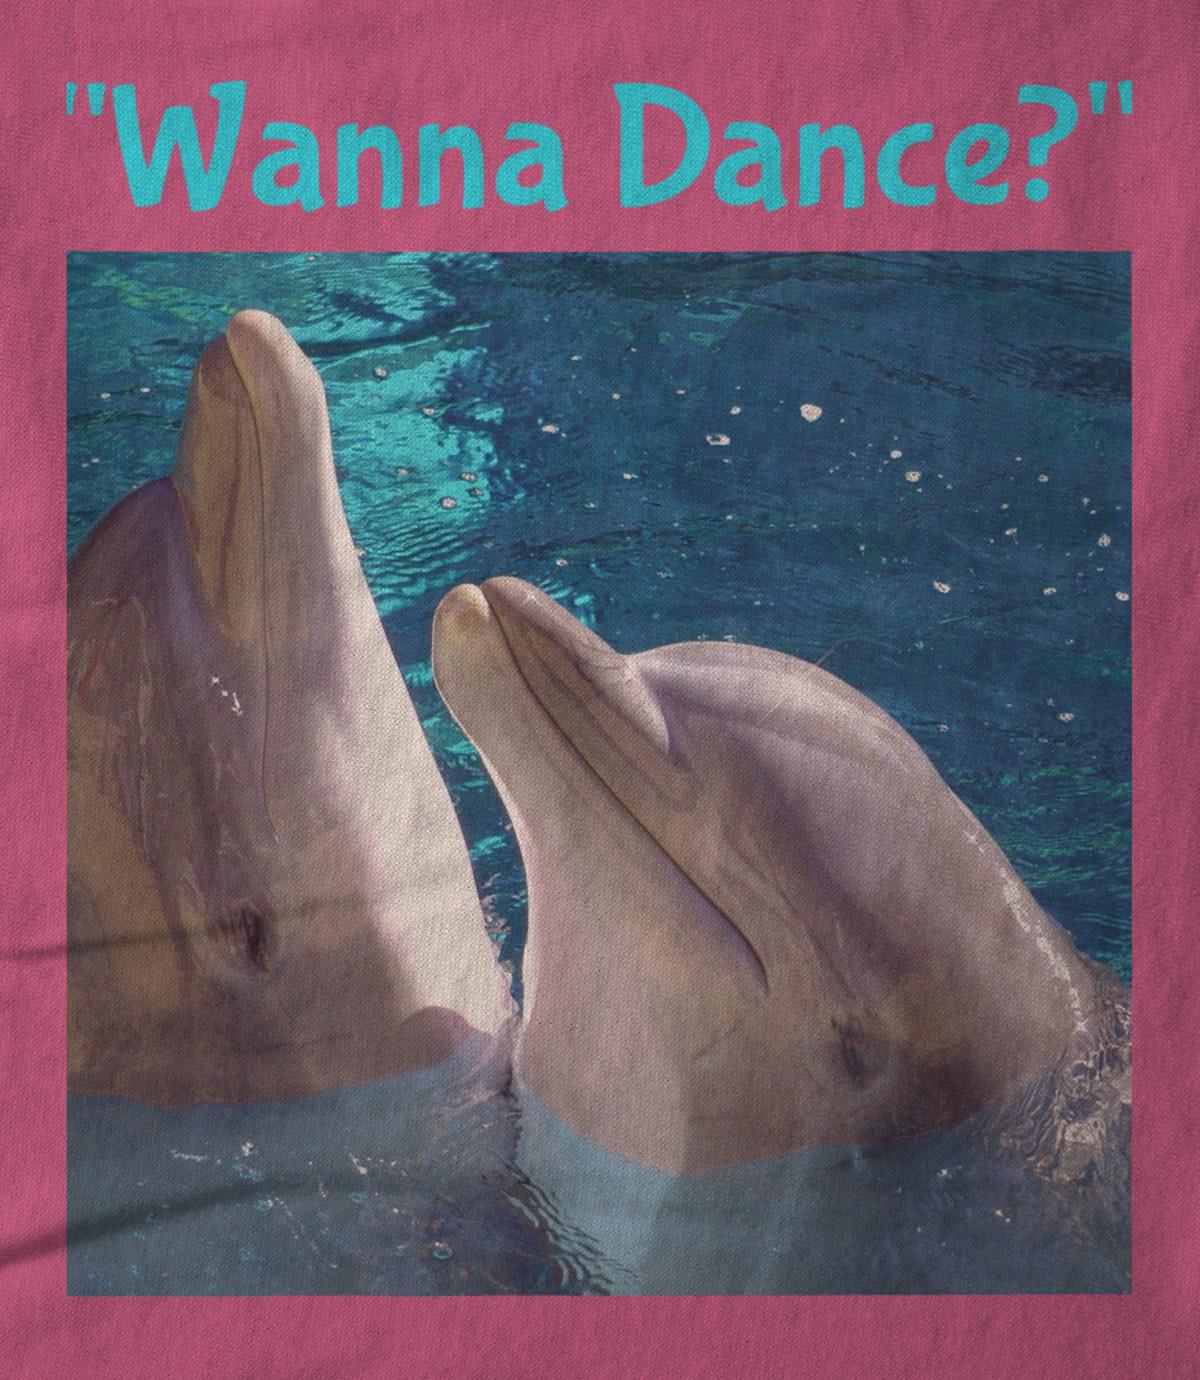 Matthew f  blowers iii  wanna dance   1505359207